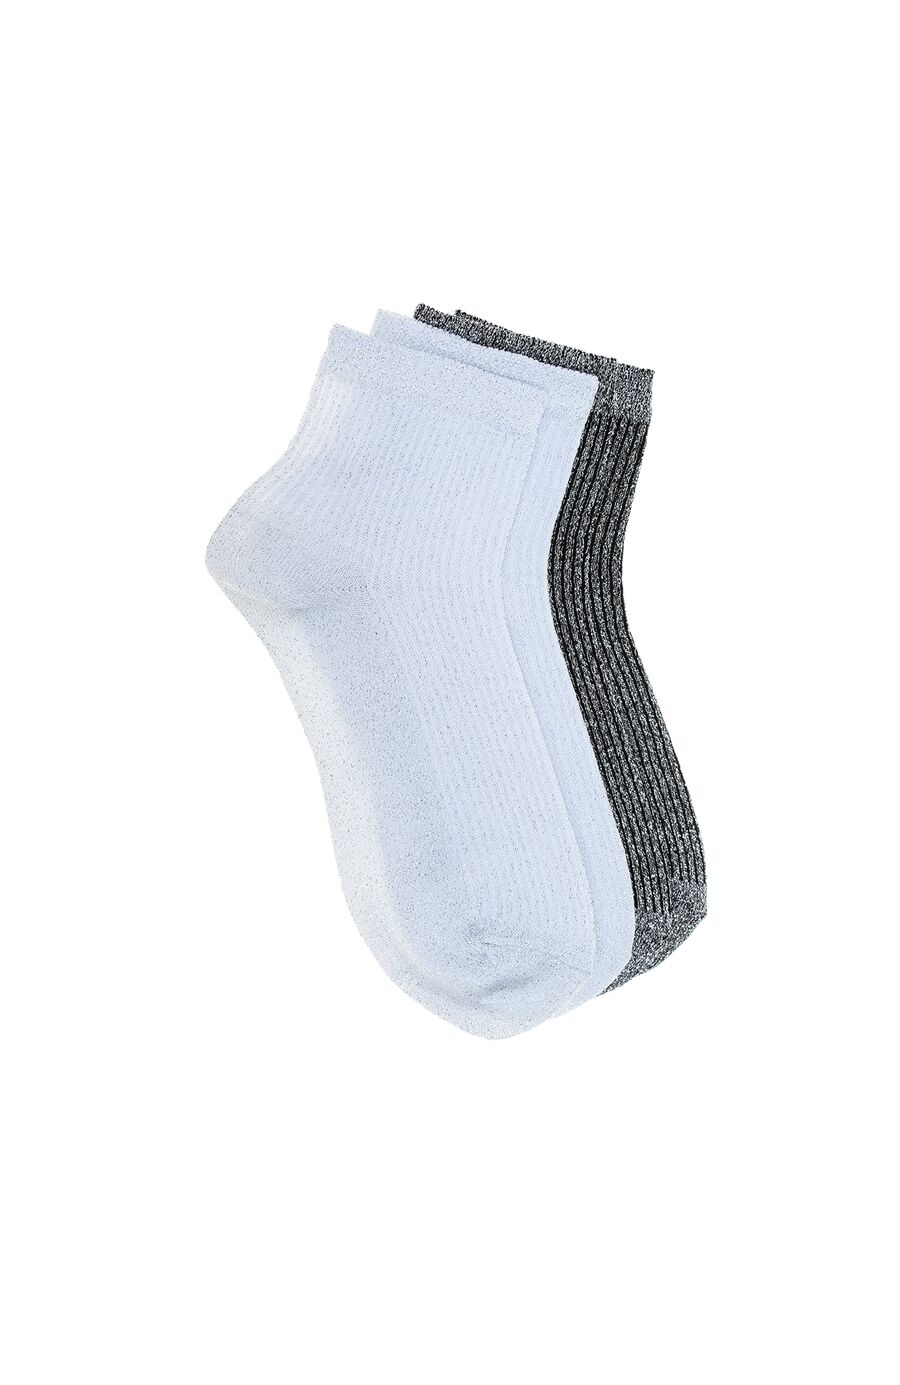 Beyaz Siyah 2'li Çorap Set